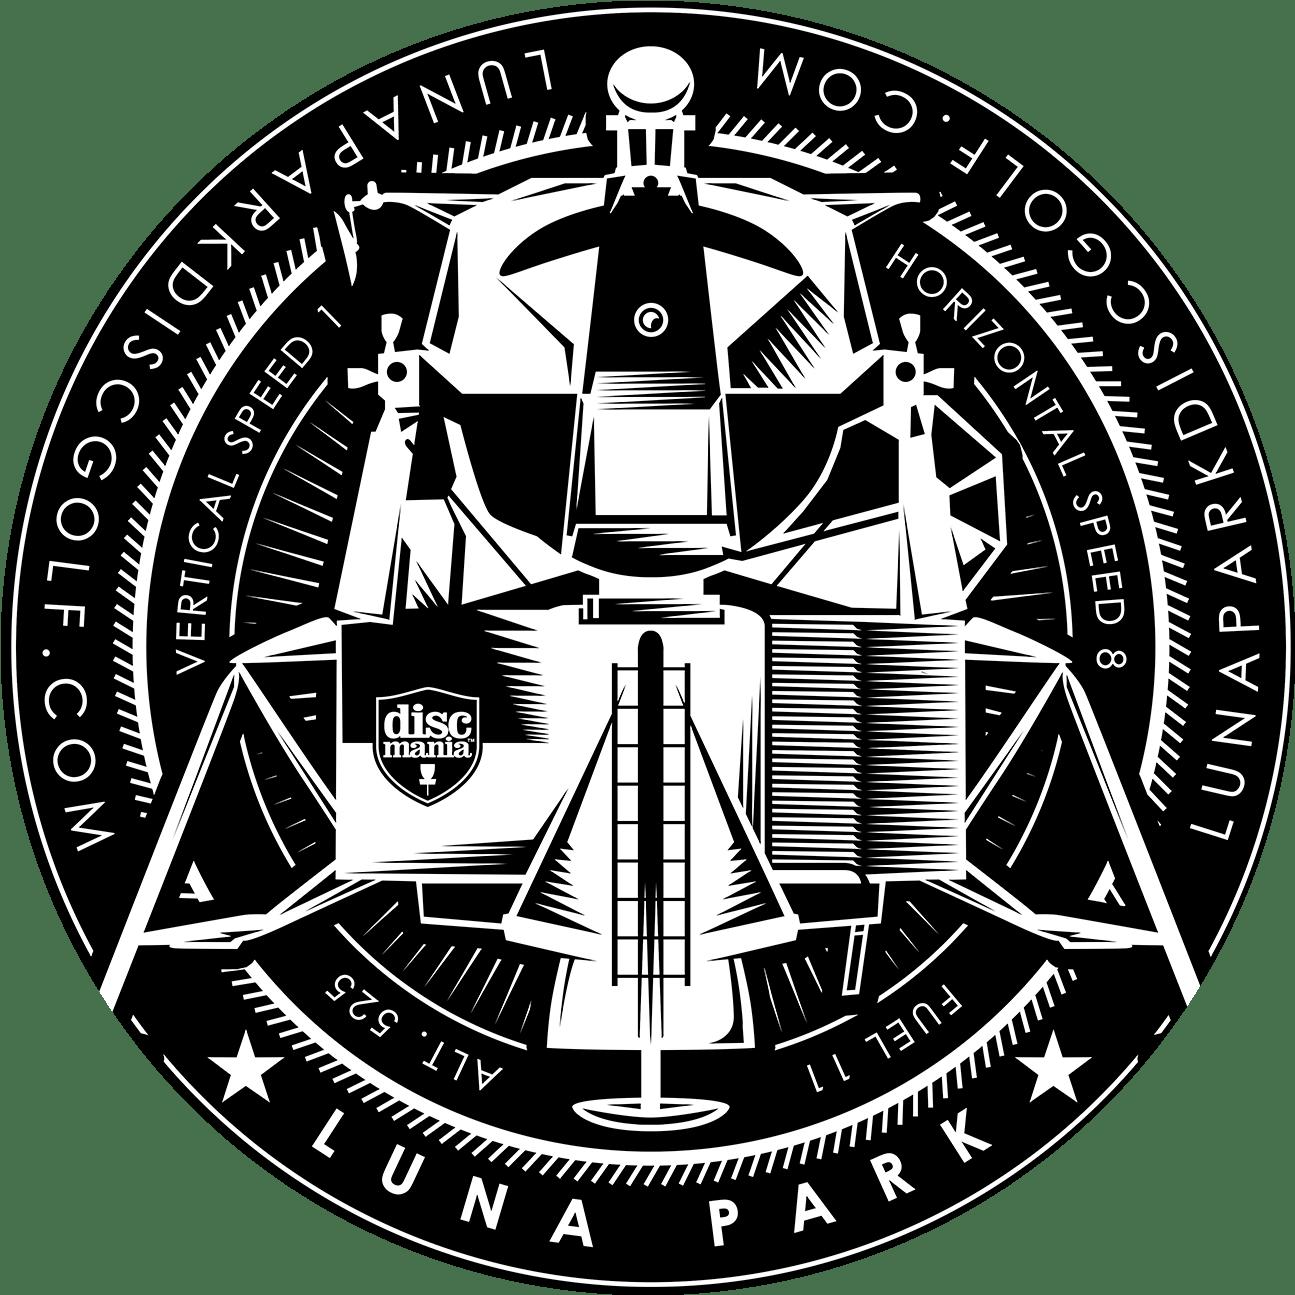 LUNA PARK DISC GOLF's account image